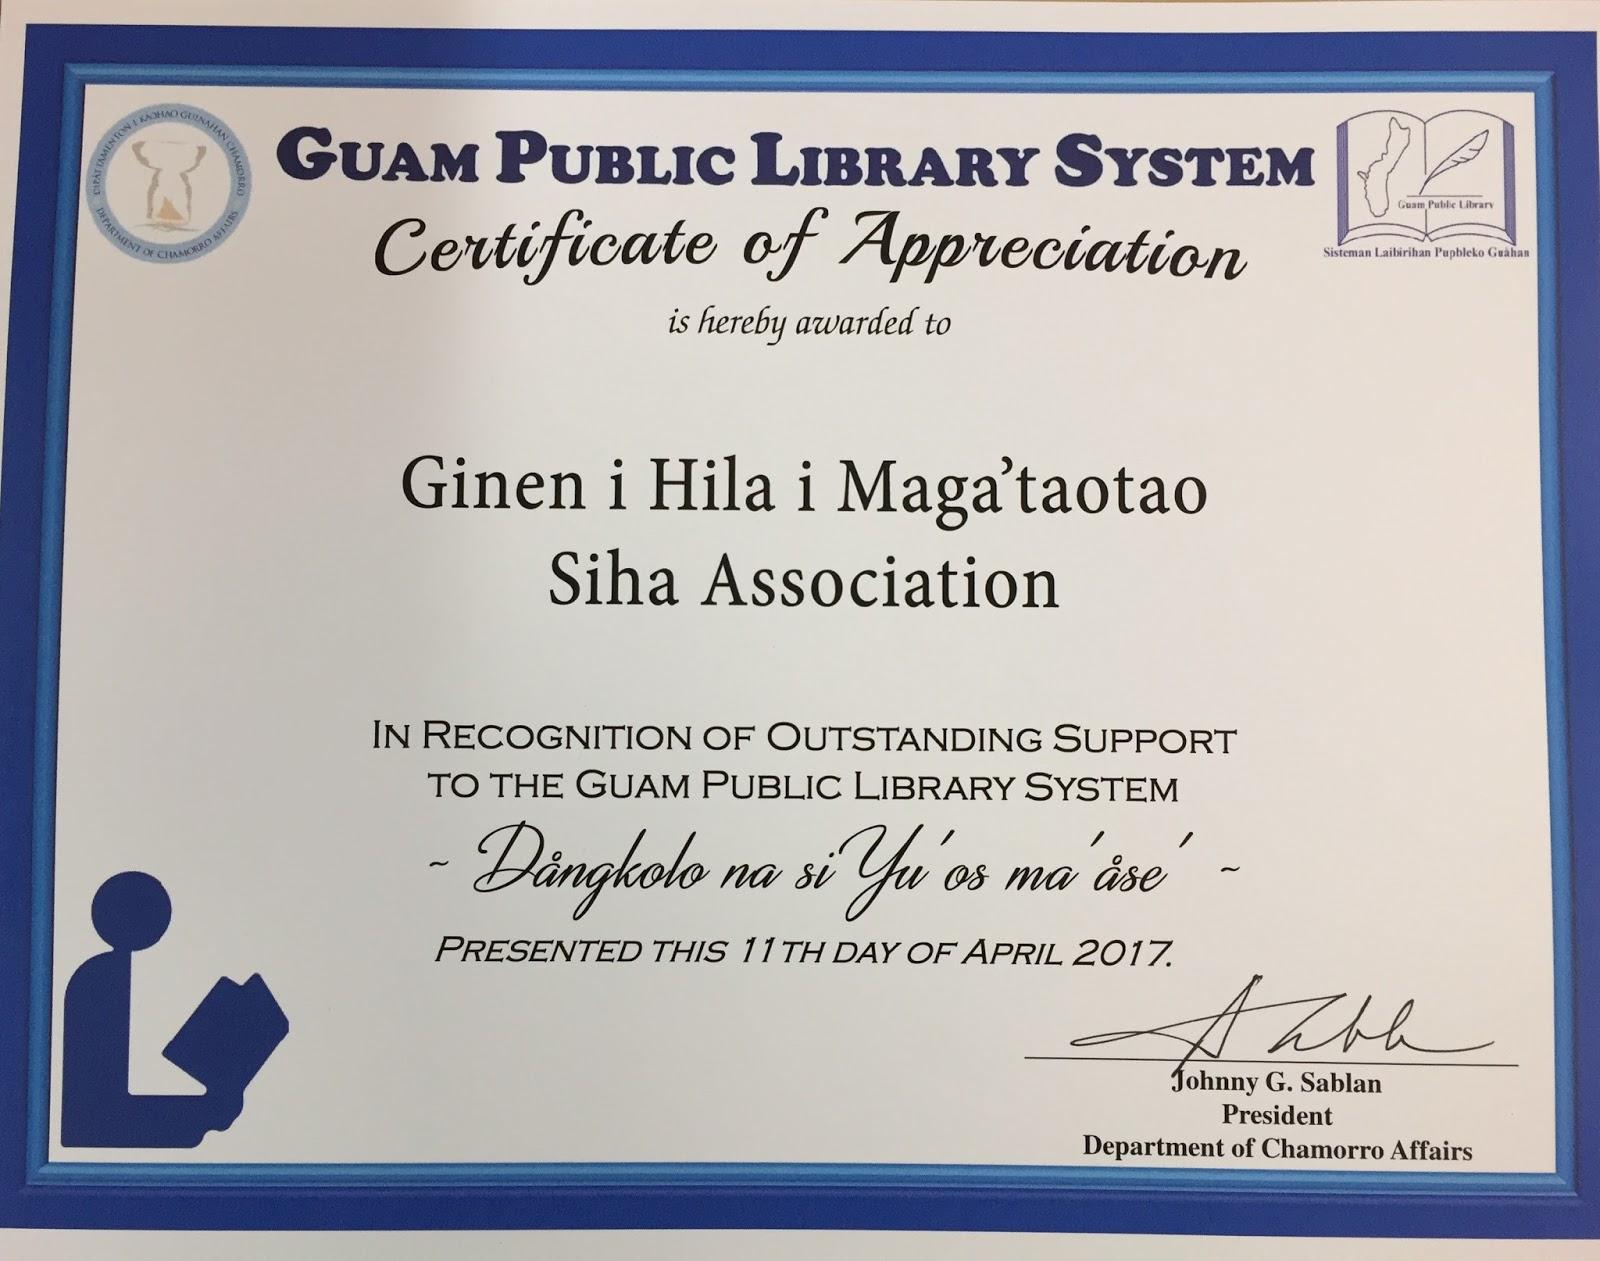 Ginen i hila i magataotao siha association guam public library guam public library system certificate of appreciation april 11 2017 yadclub Choice Image